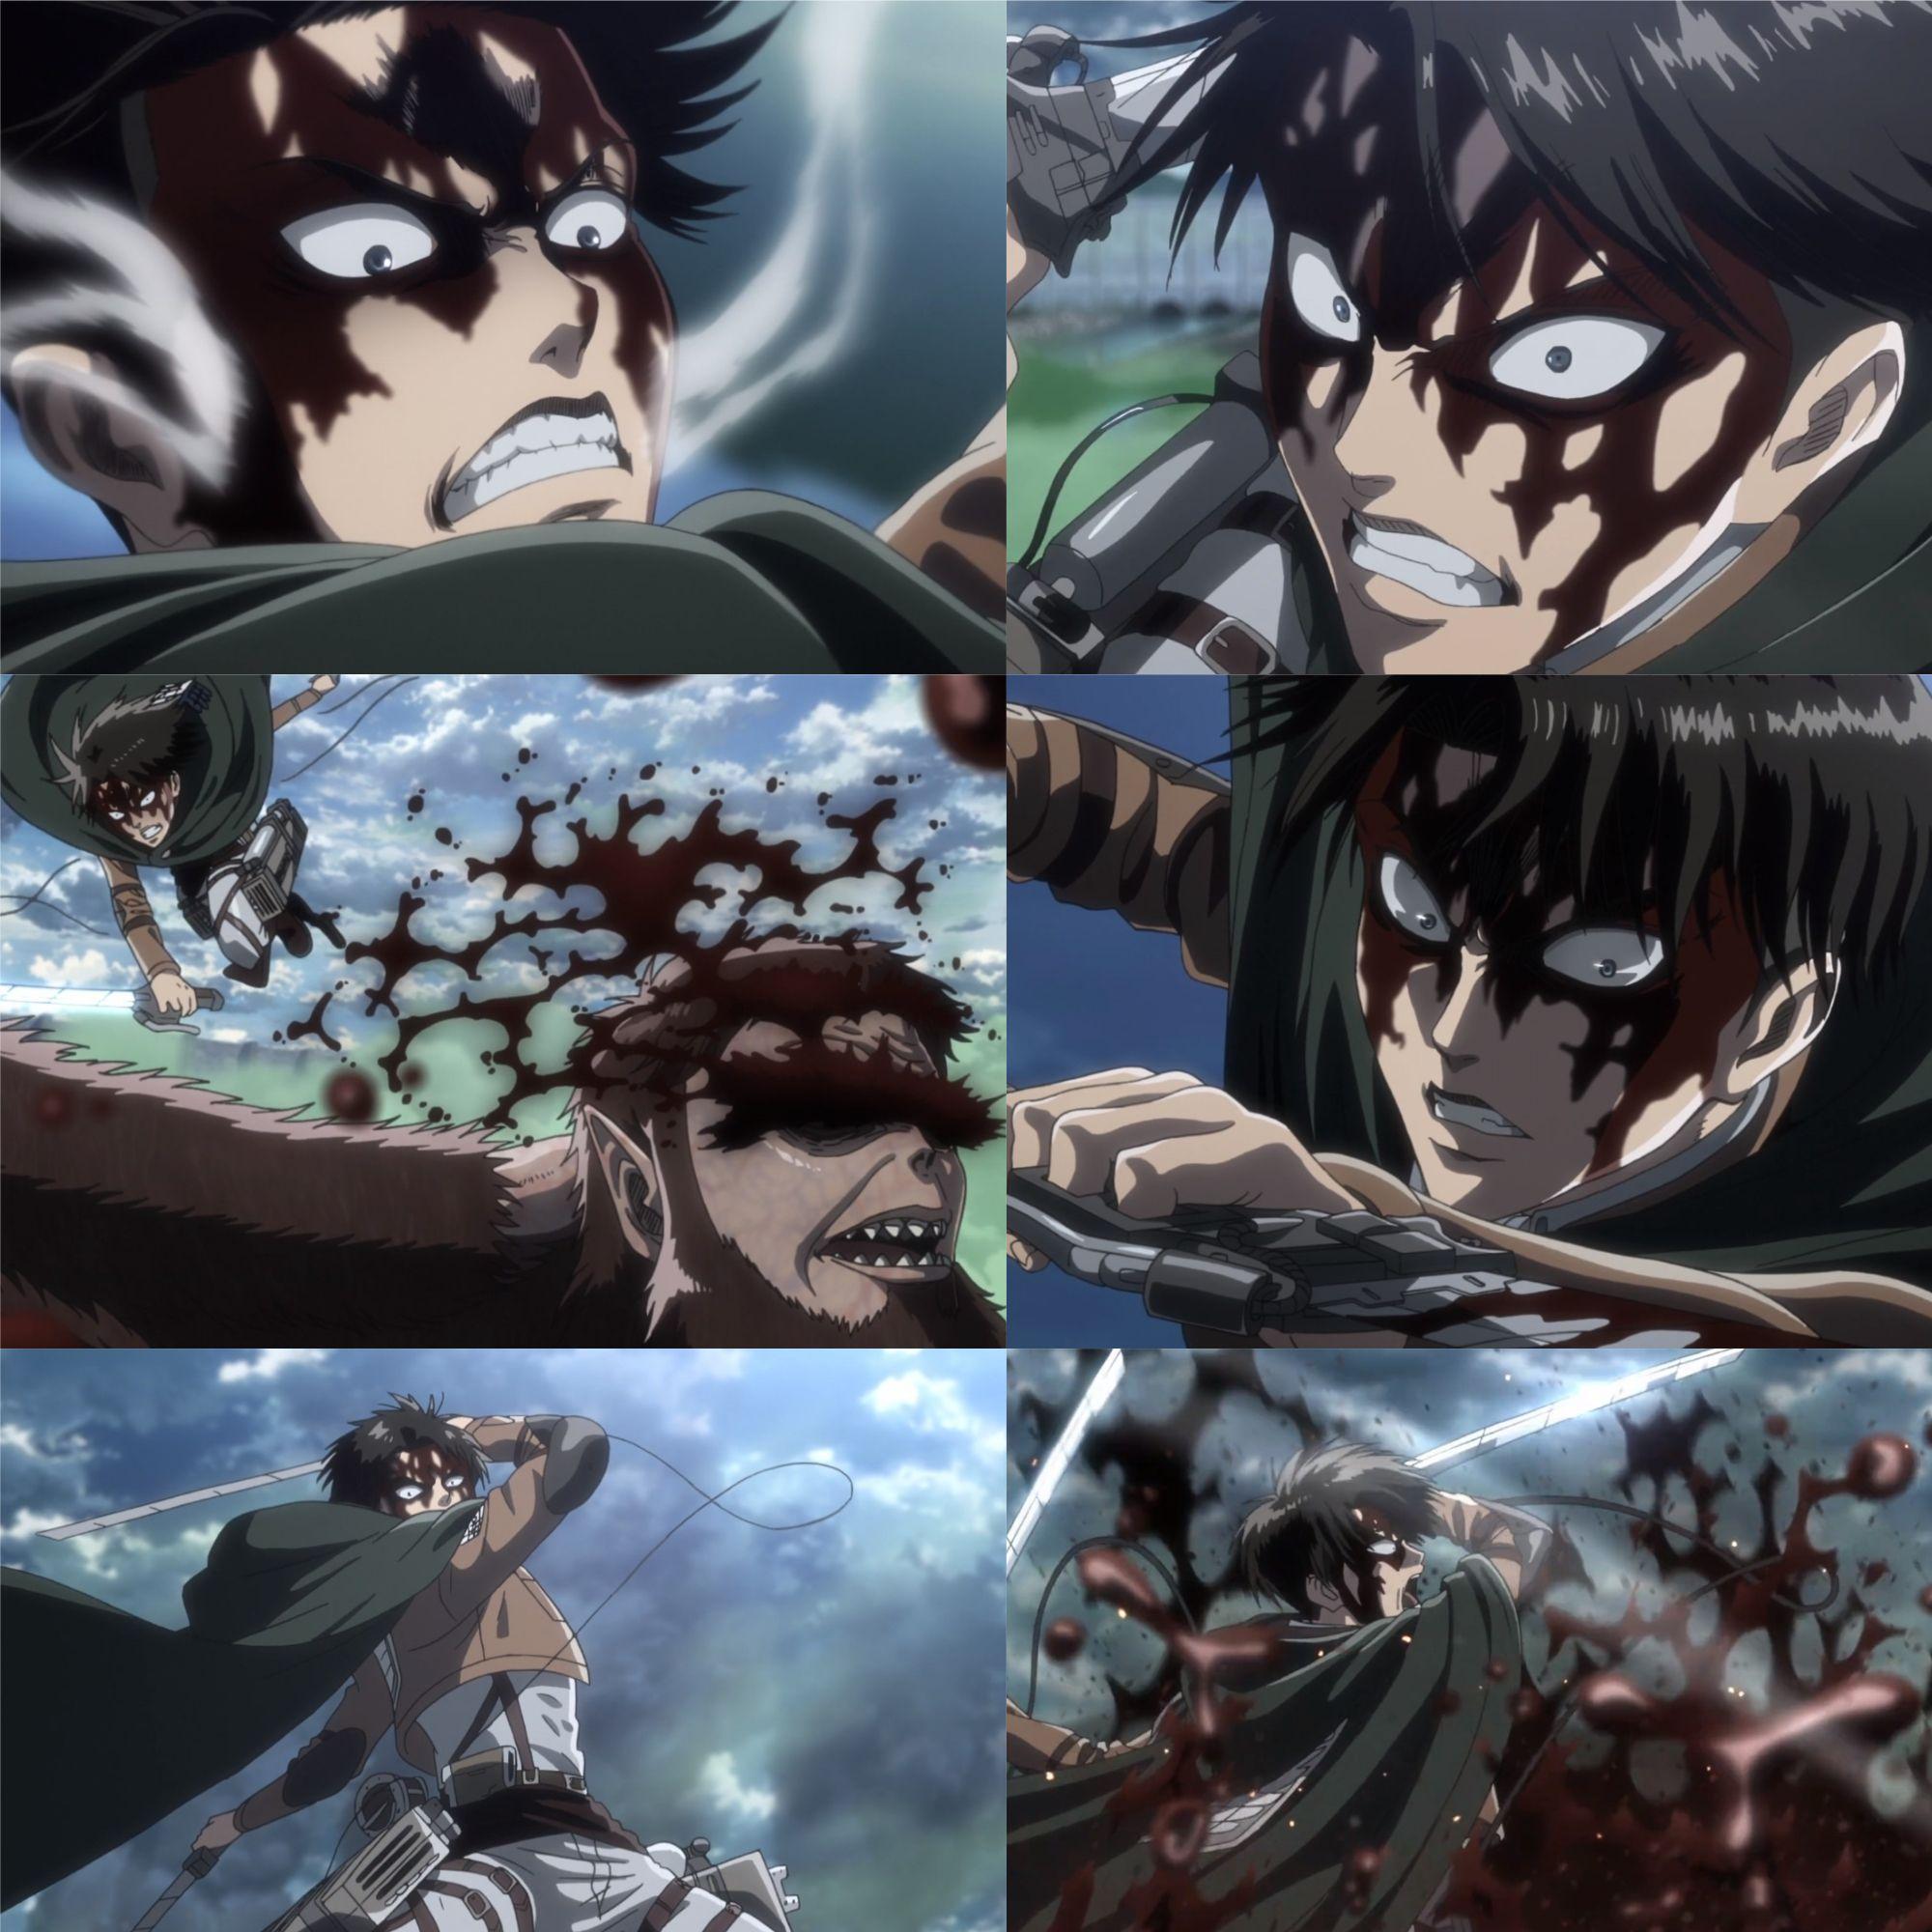 Levi Vs Beast Titan Attack On Titan Shingeki No Kyojin Season 3 Episode 17 Snk Shingek Attack On Titan Season Attack On Titan Art Attack On Titan Levi